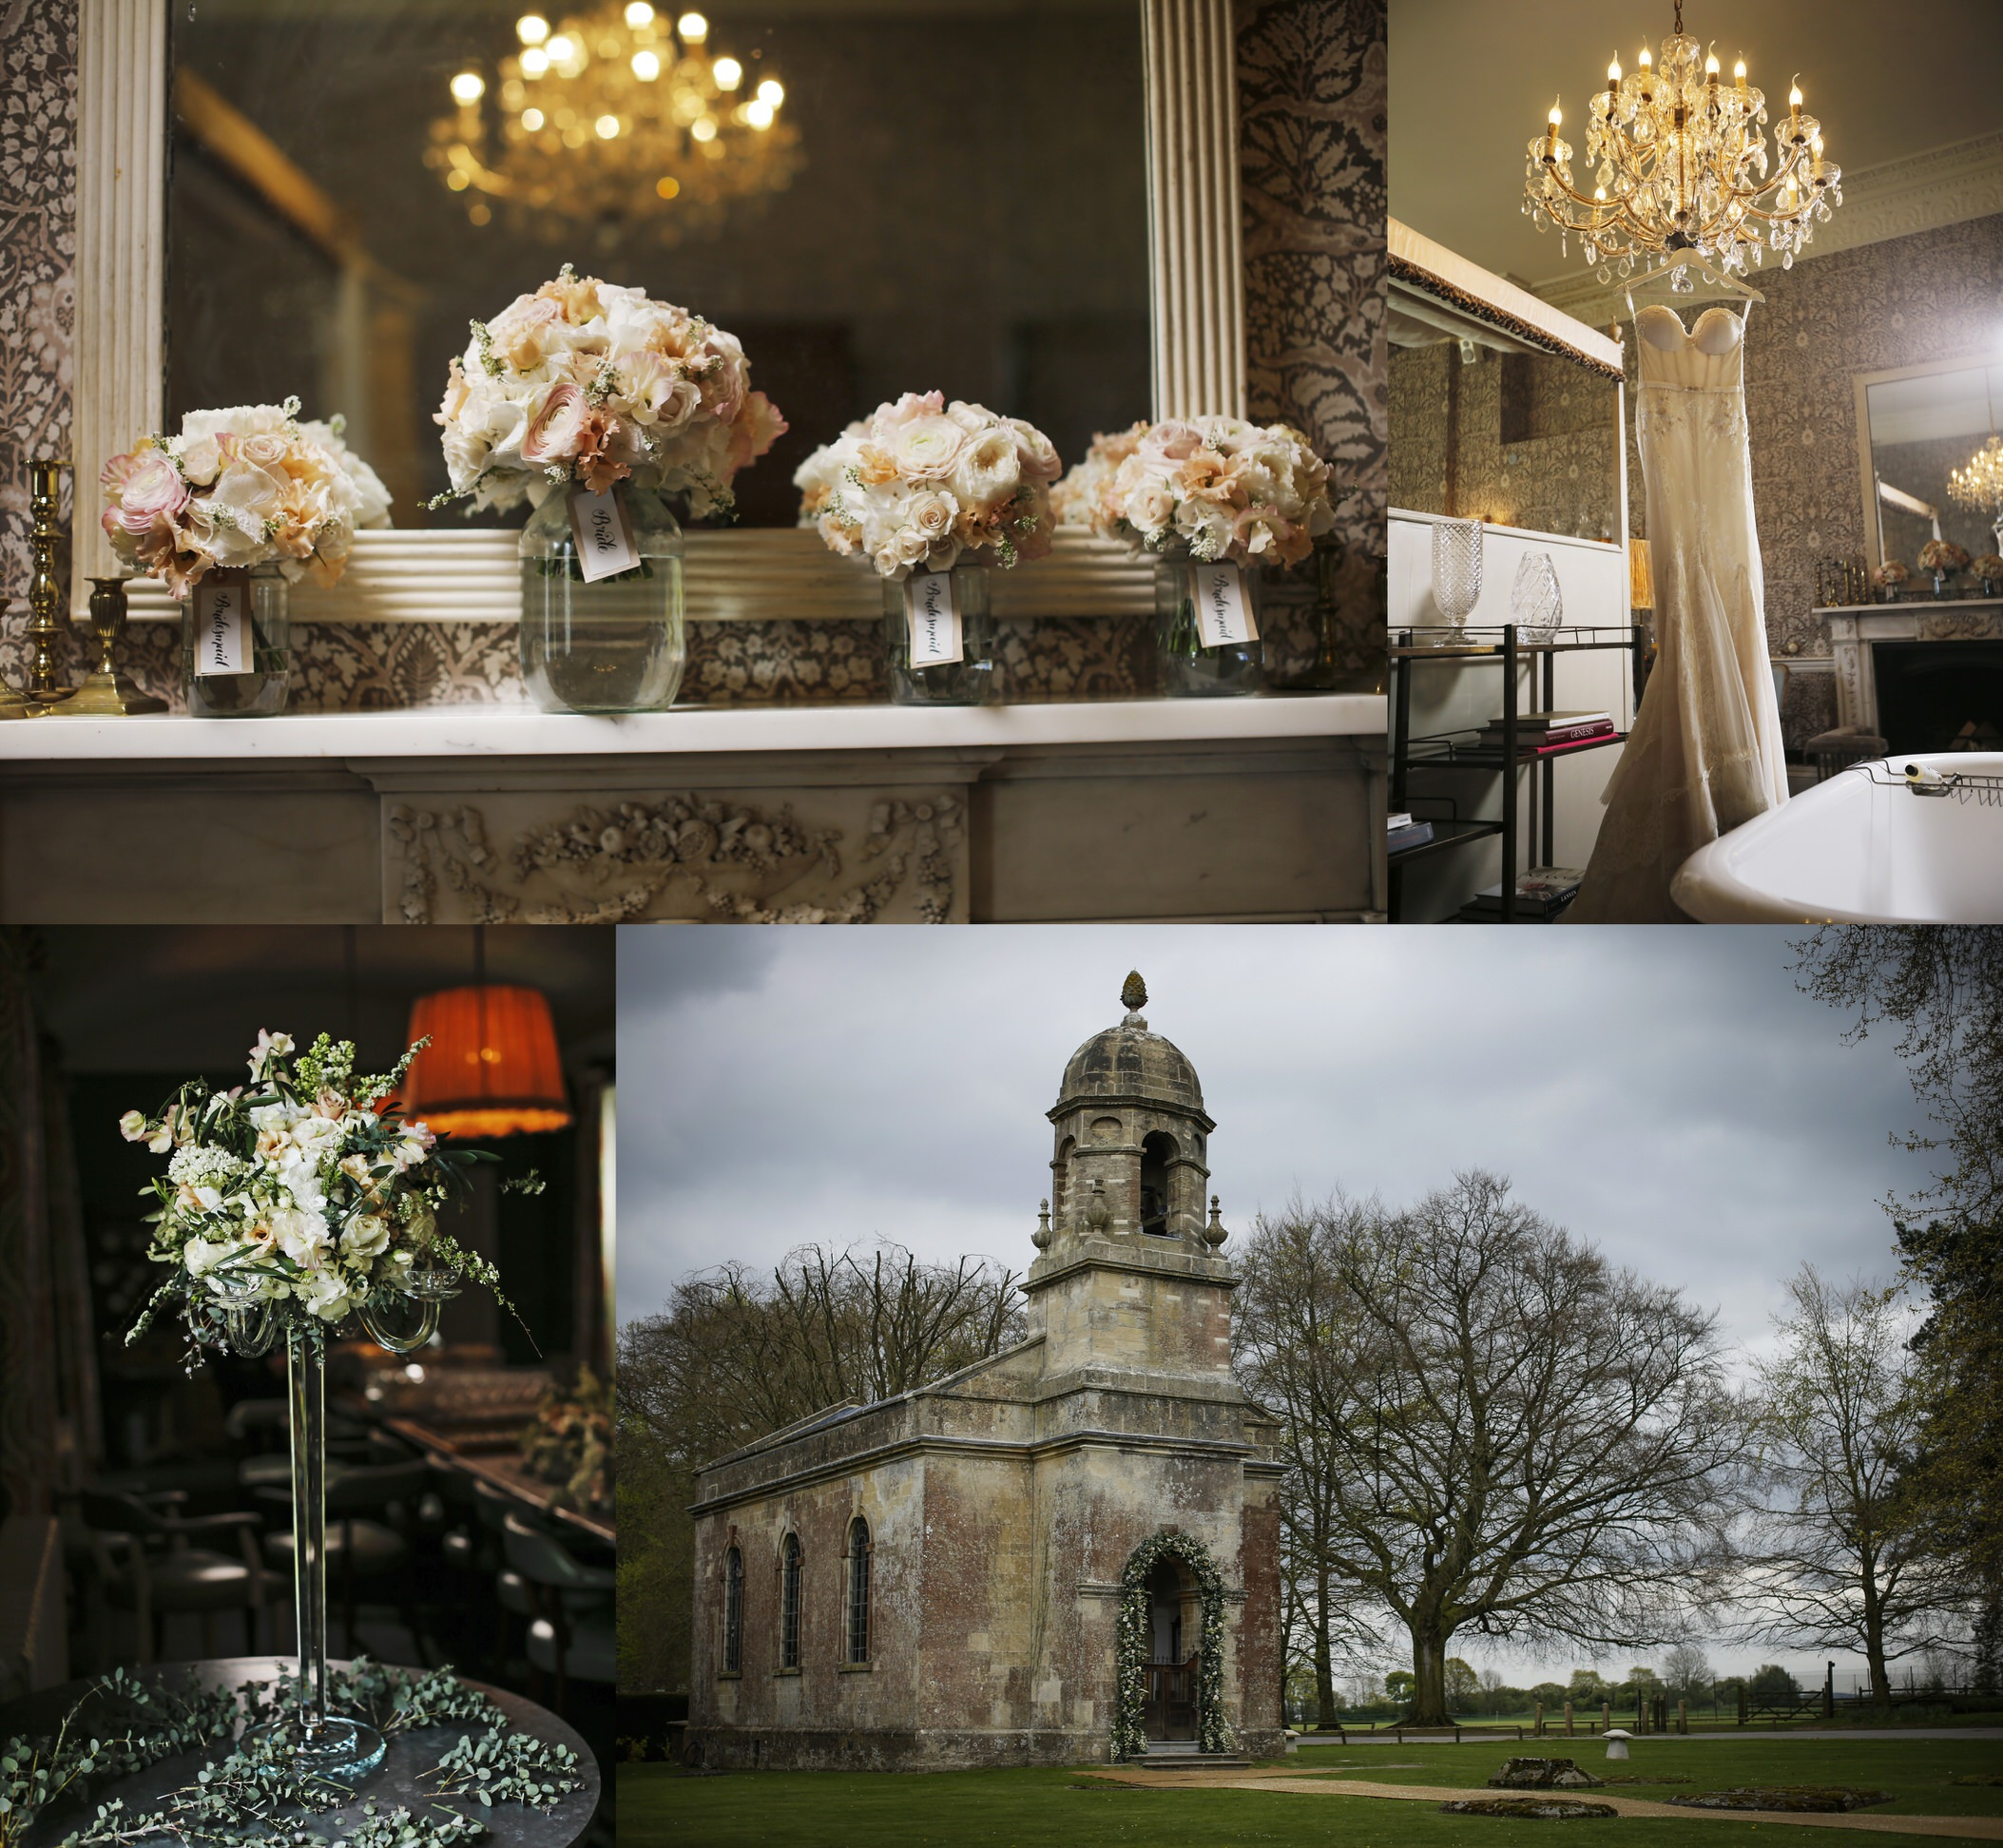 babington-house-wedding-at-soho-house-london-wedding-photographer_0002.jpg